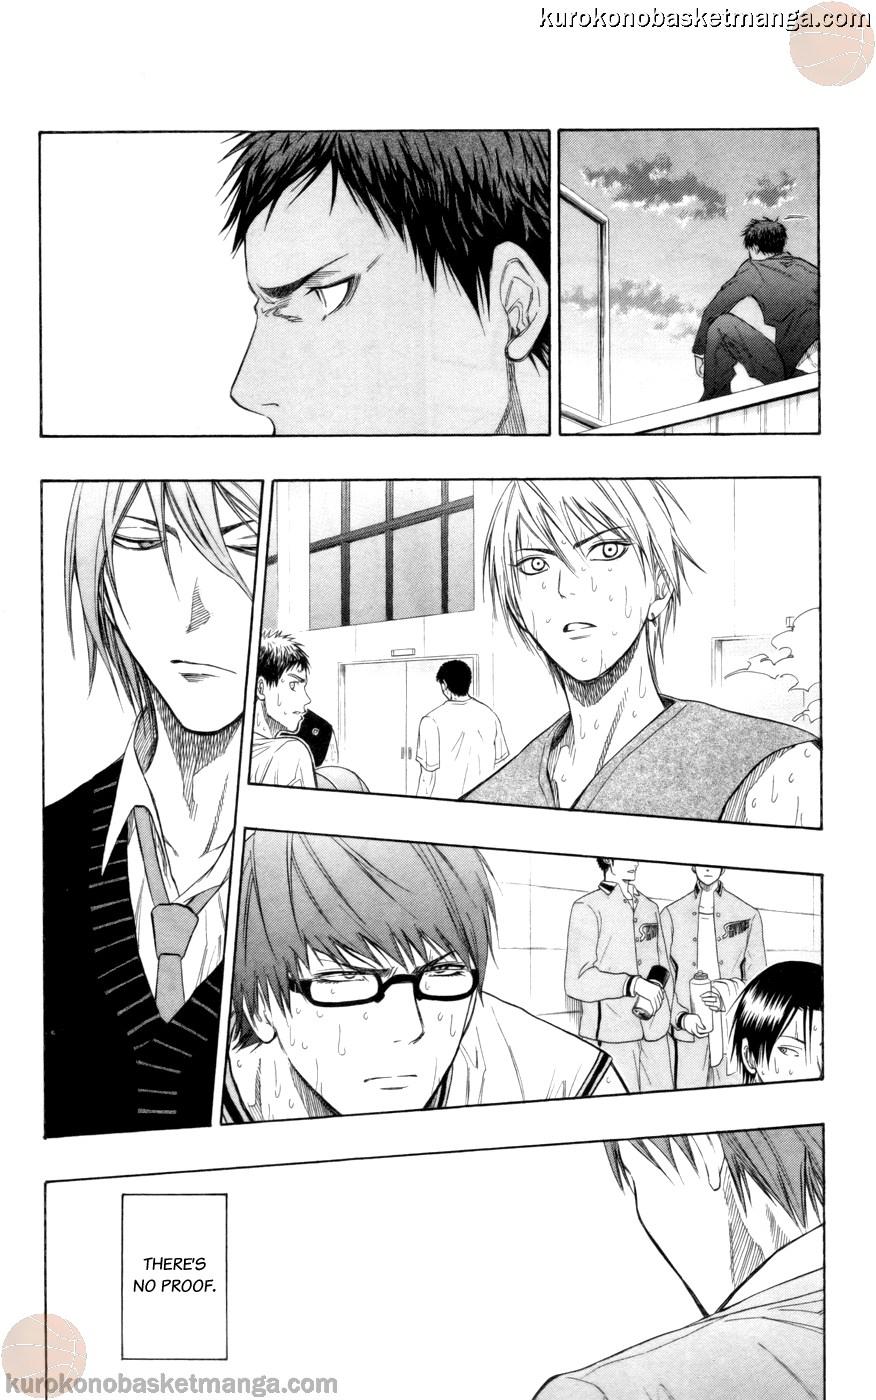 Kuroko no Basket Manga Chapter 83 - Image 14